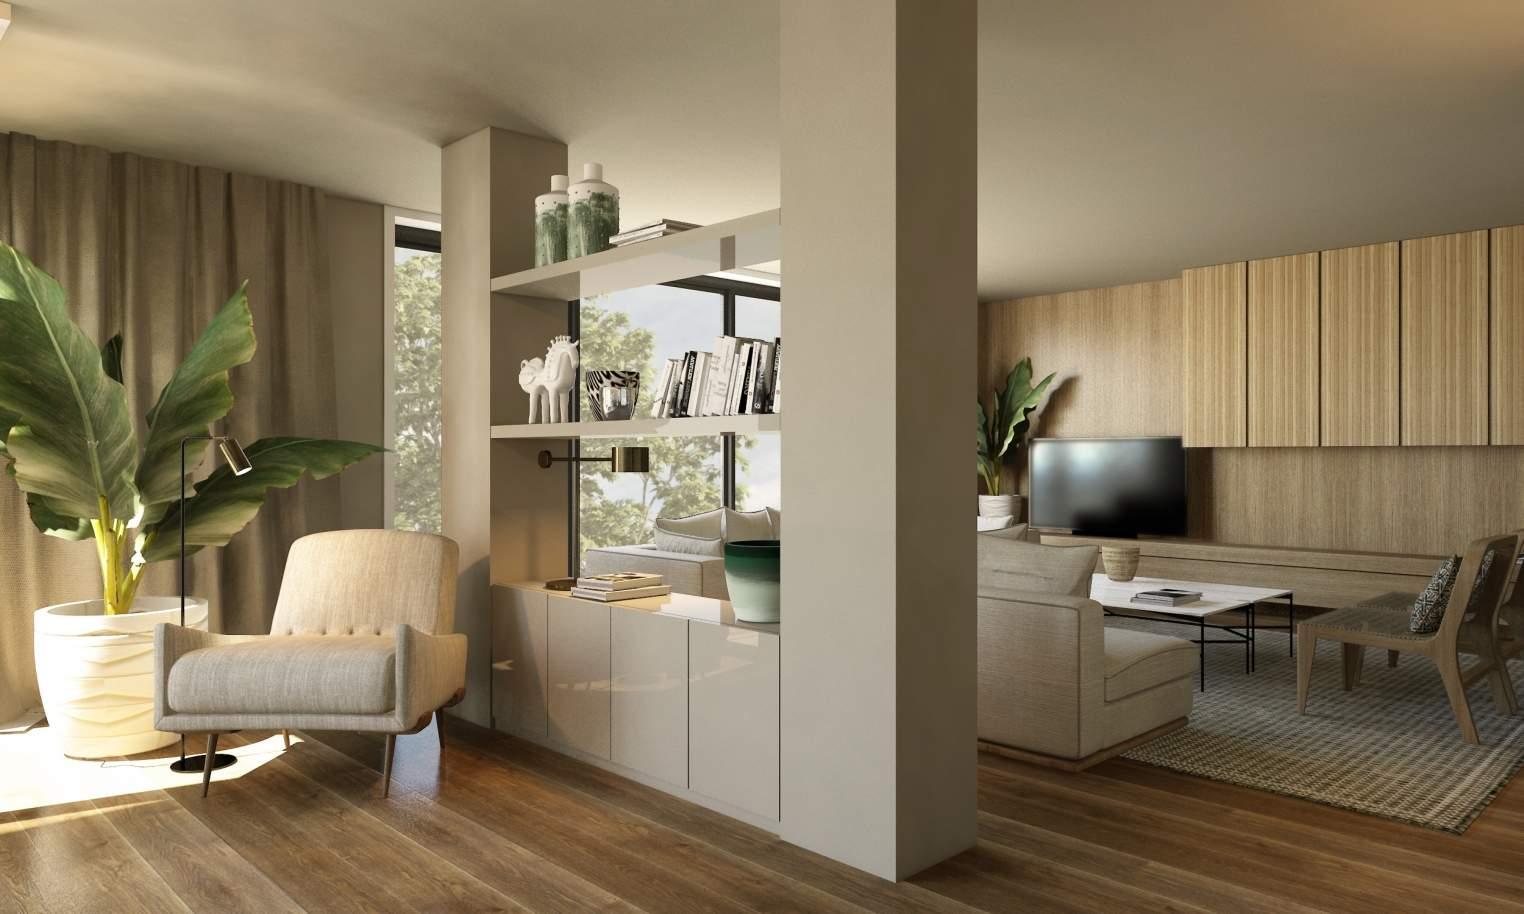 venta-de-apartamento-de-lujo-nuevo-con-balcon-foz-porto-portugal